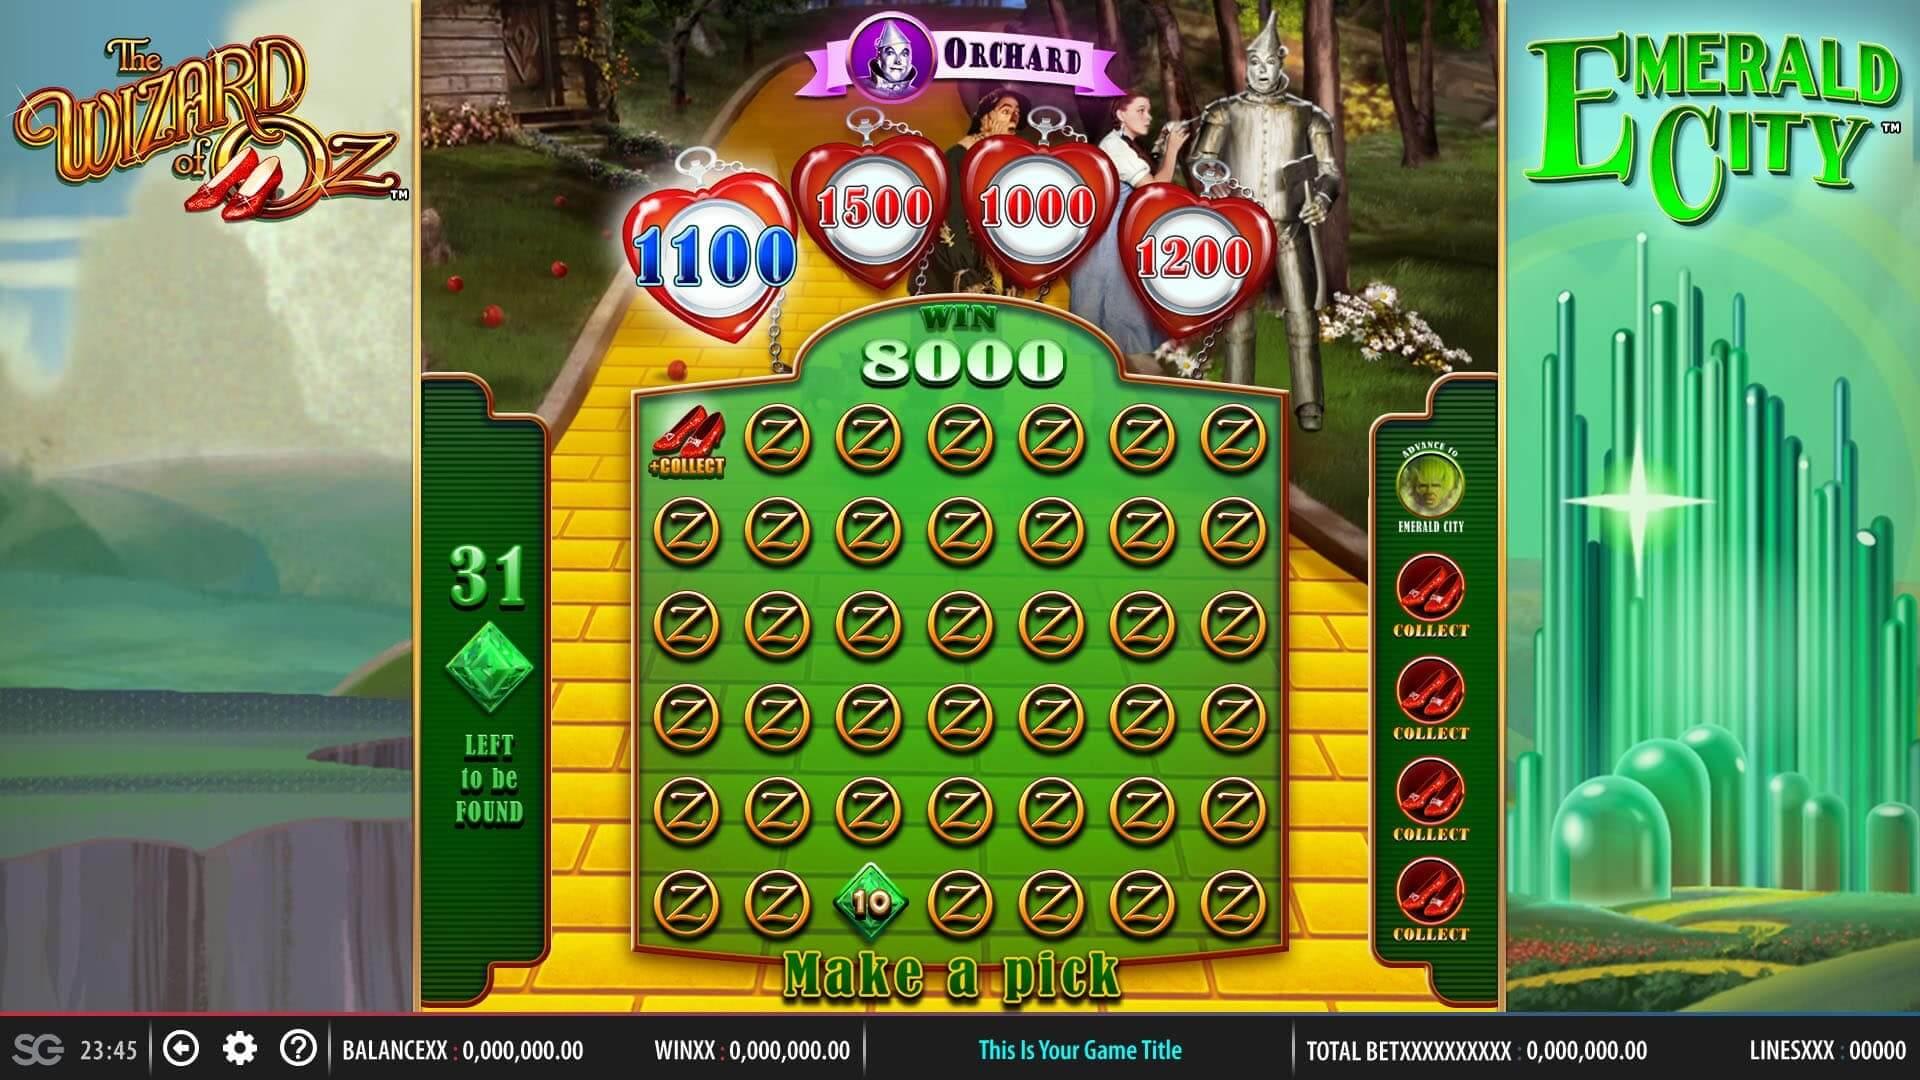 Tin Man bonus game from Wizard of Oz Emerald City online slot